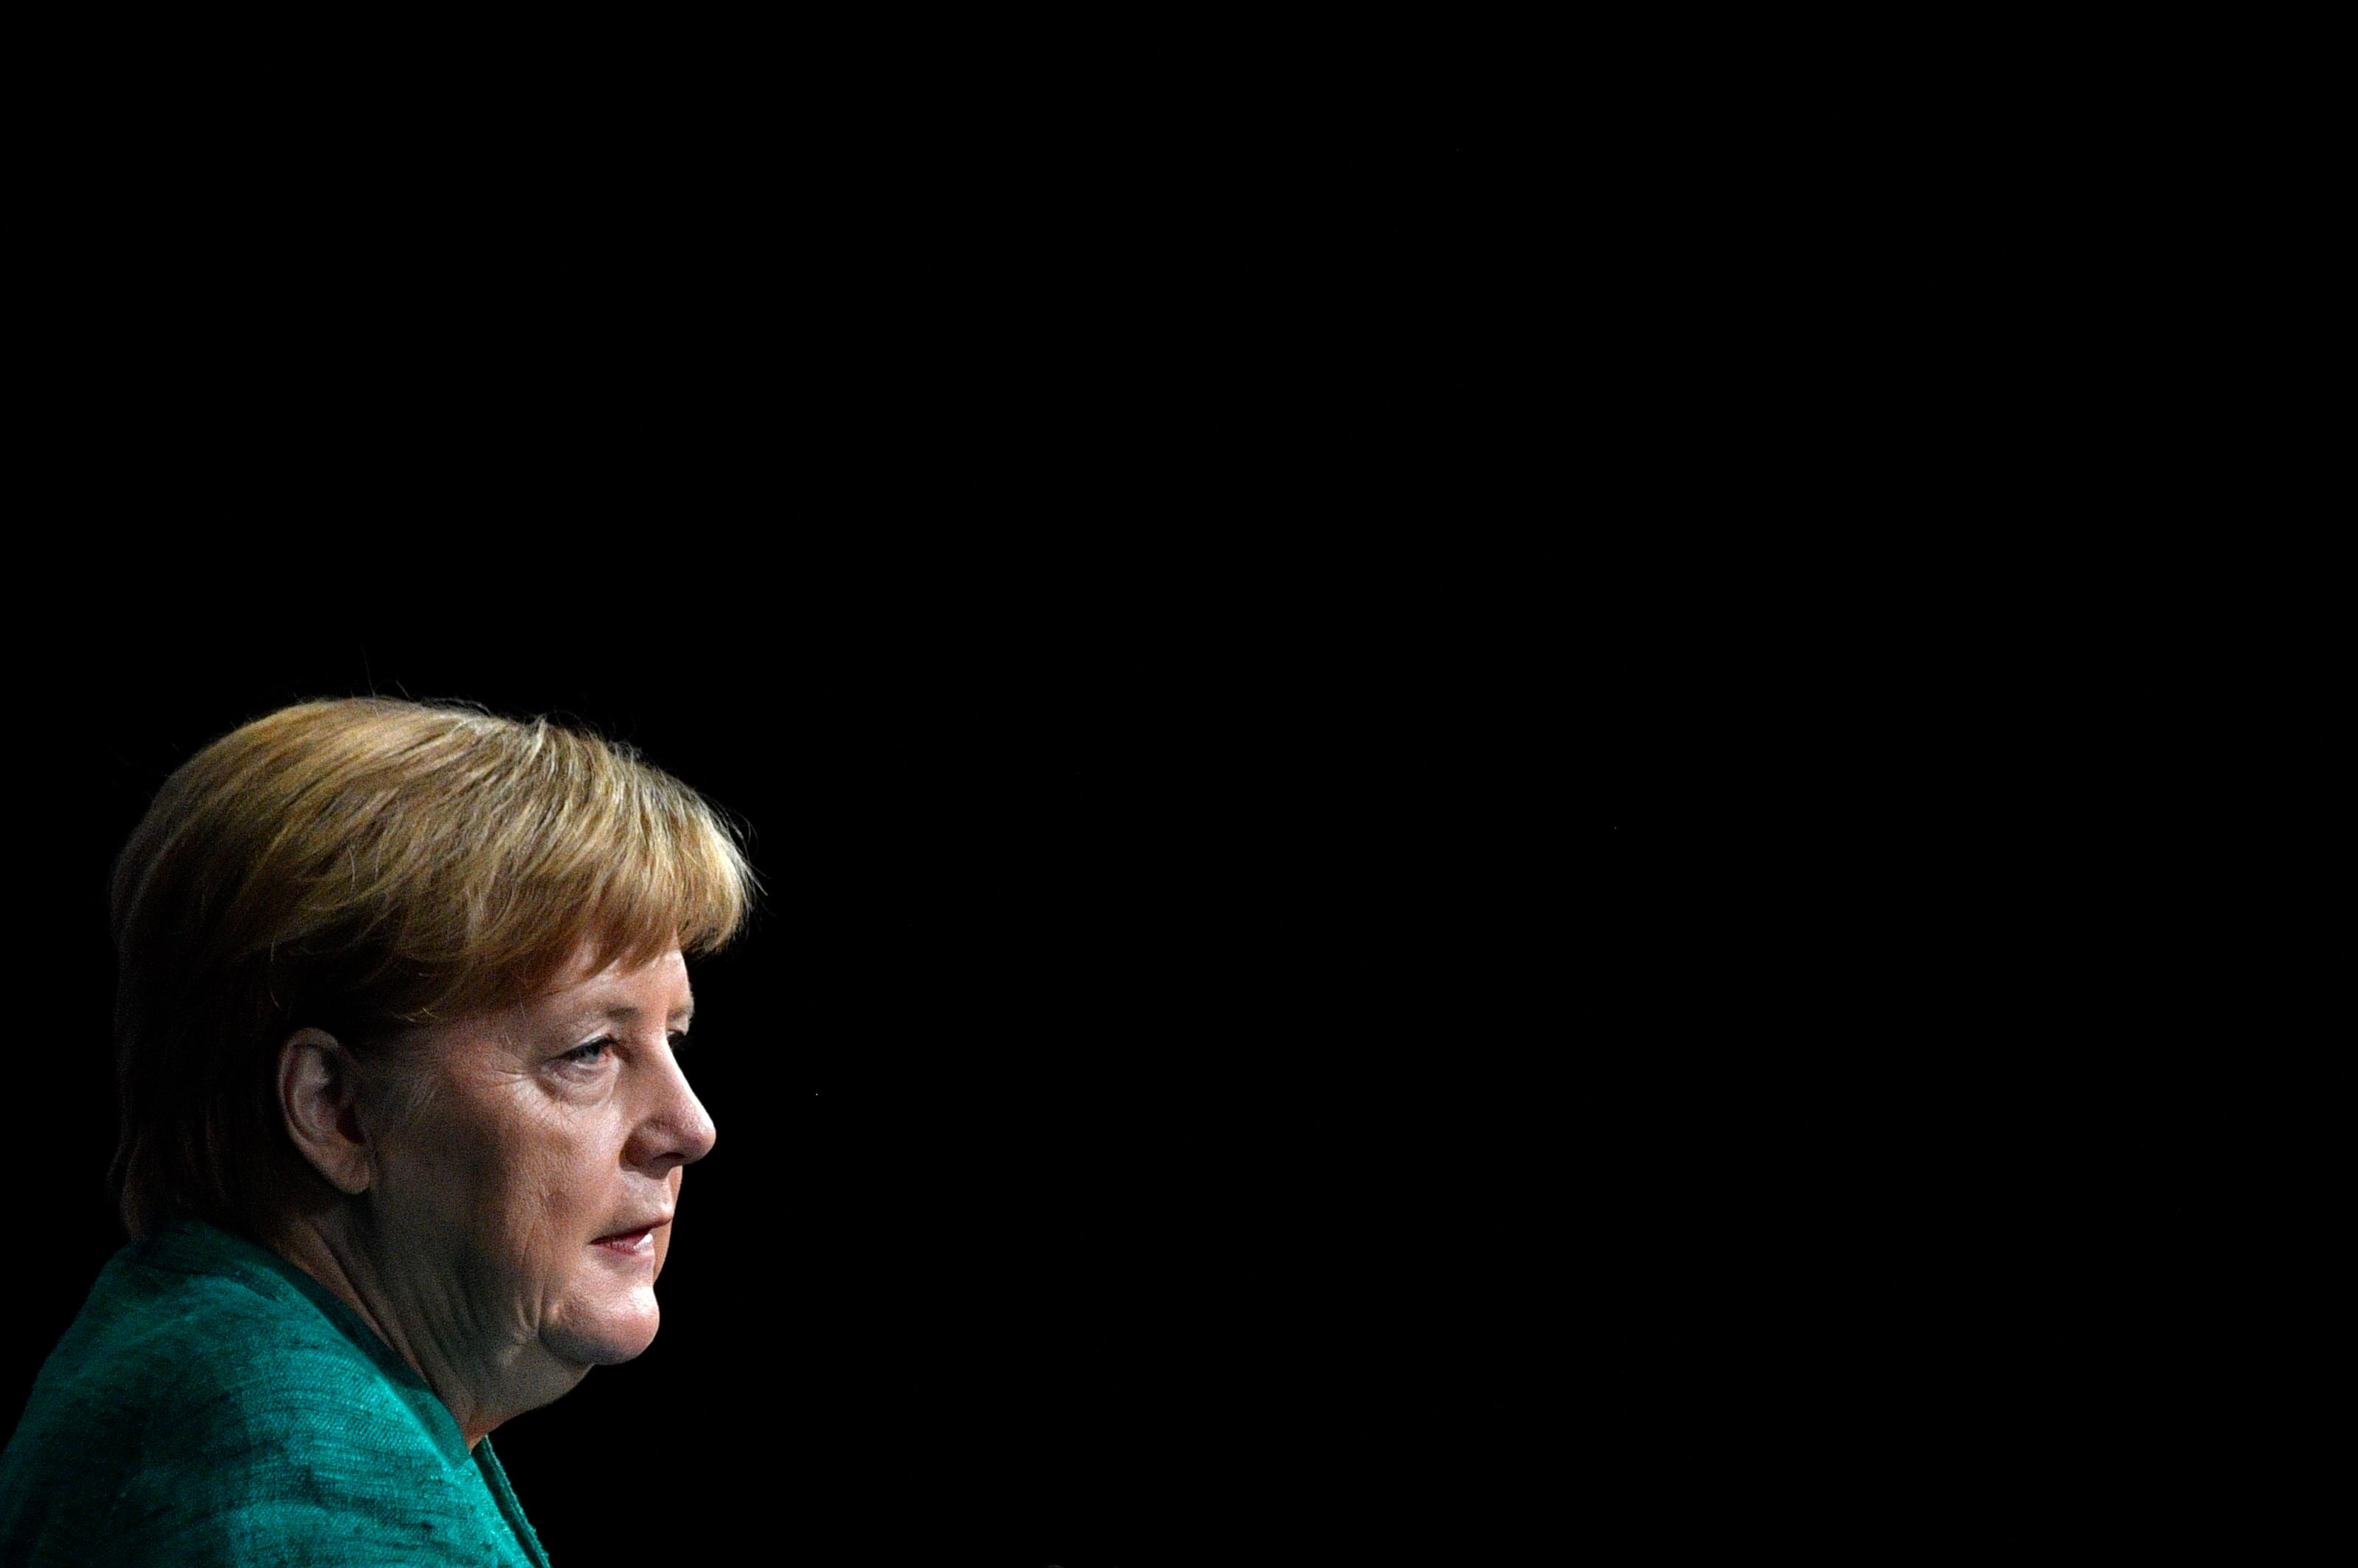 Merkel says still unclear what Britain wants in Brexit talks